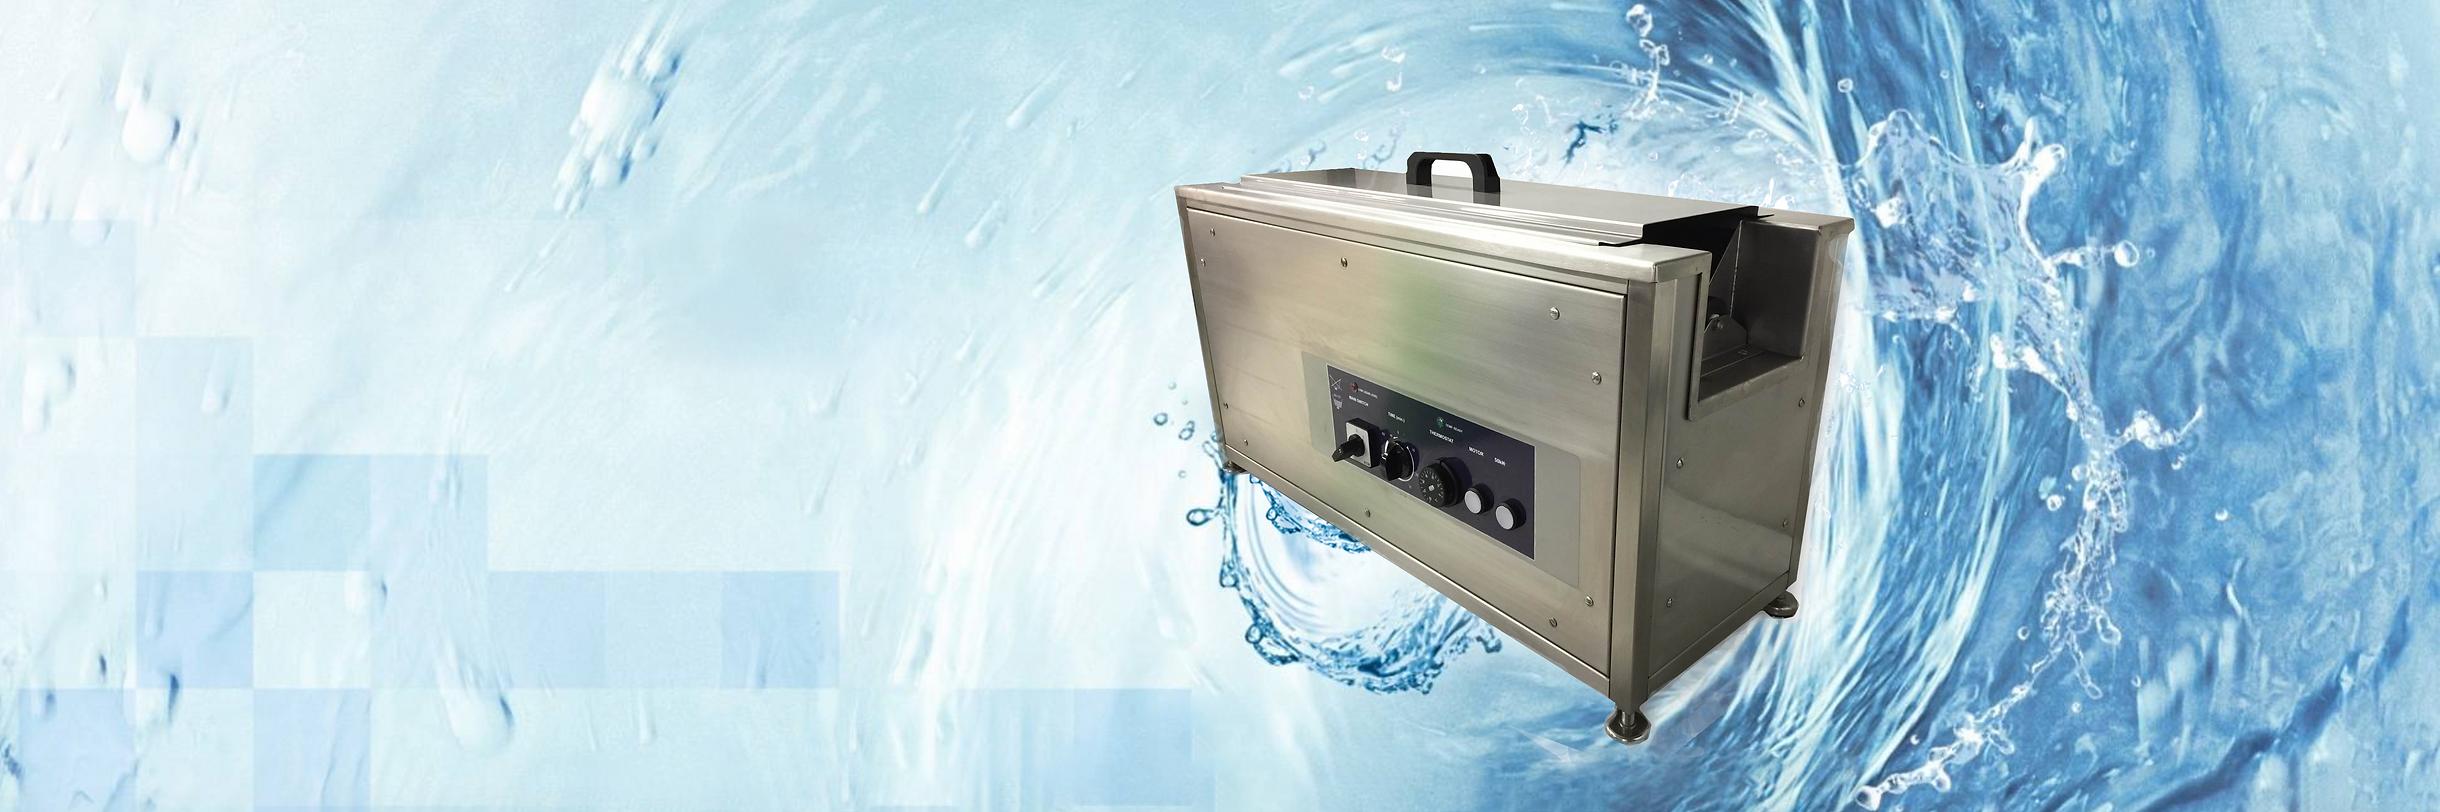 Nettoyage anilox petite laize par ultrasons U 650M